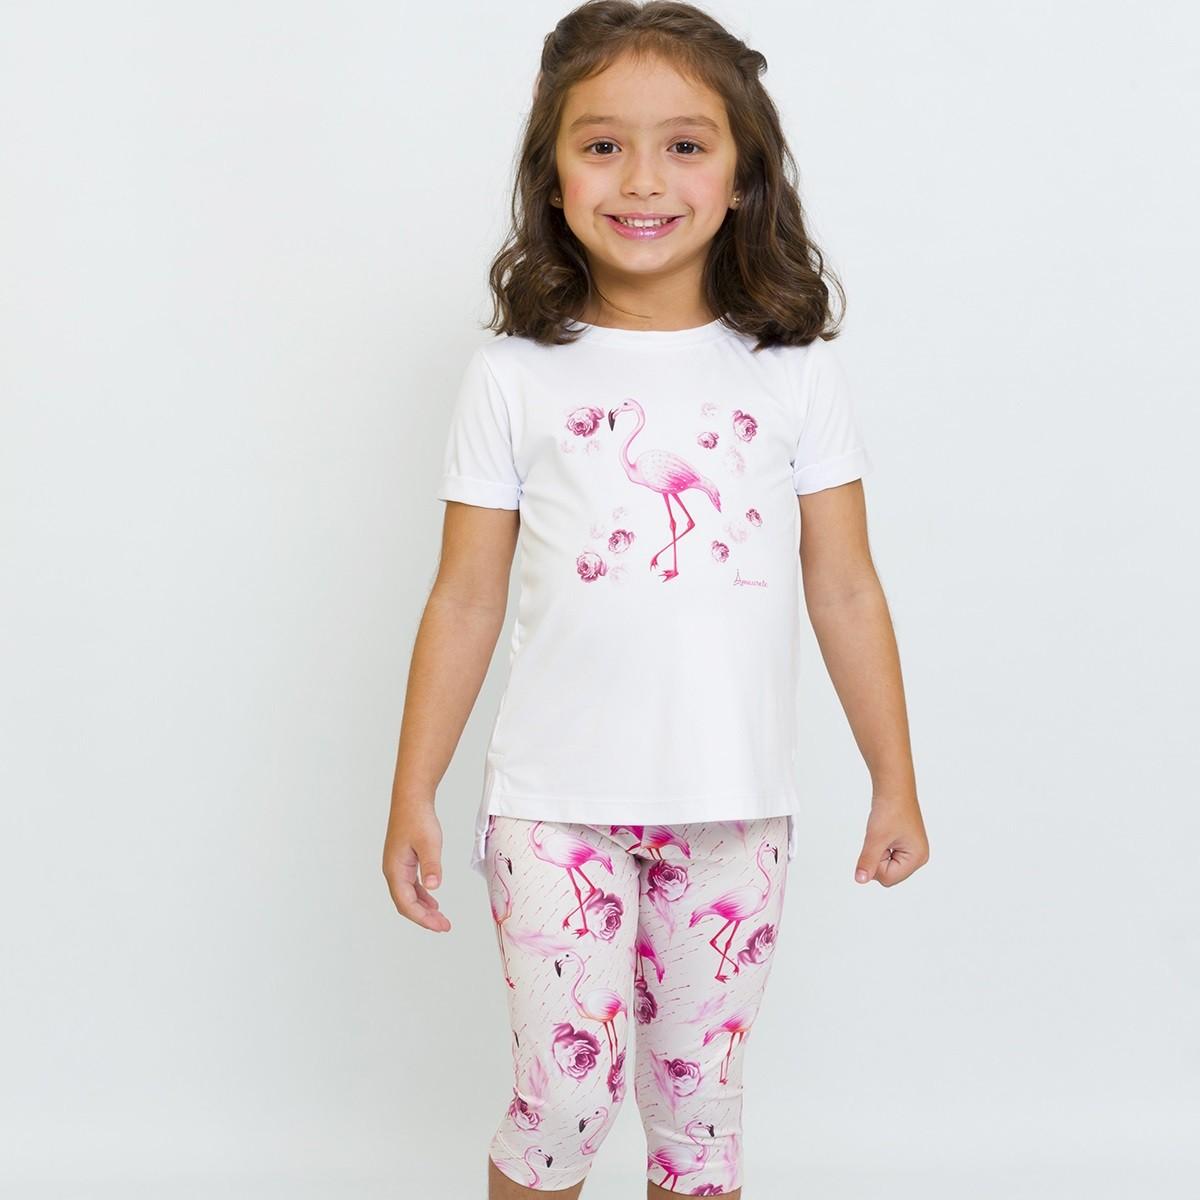 BAZAR - Conjunto Infantil Blusa e Legging Curta Flamingo